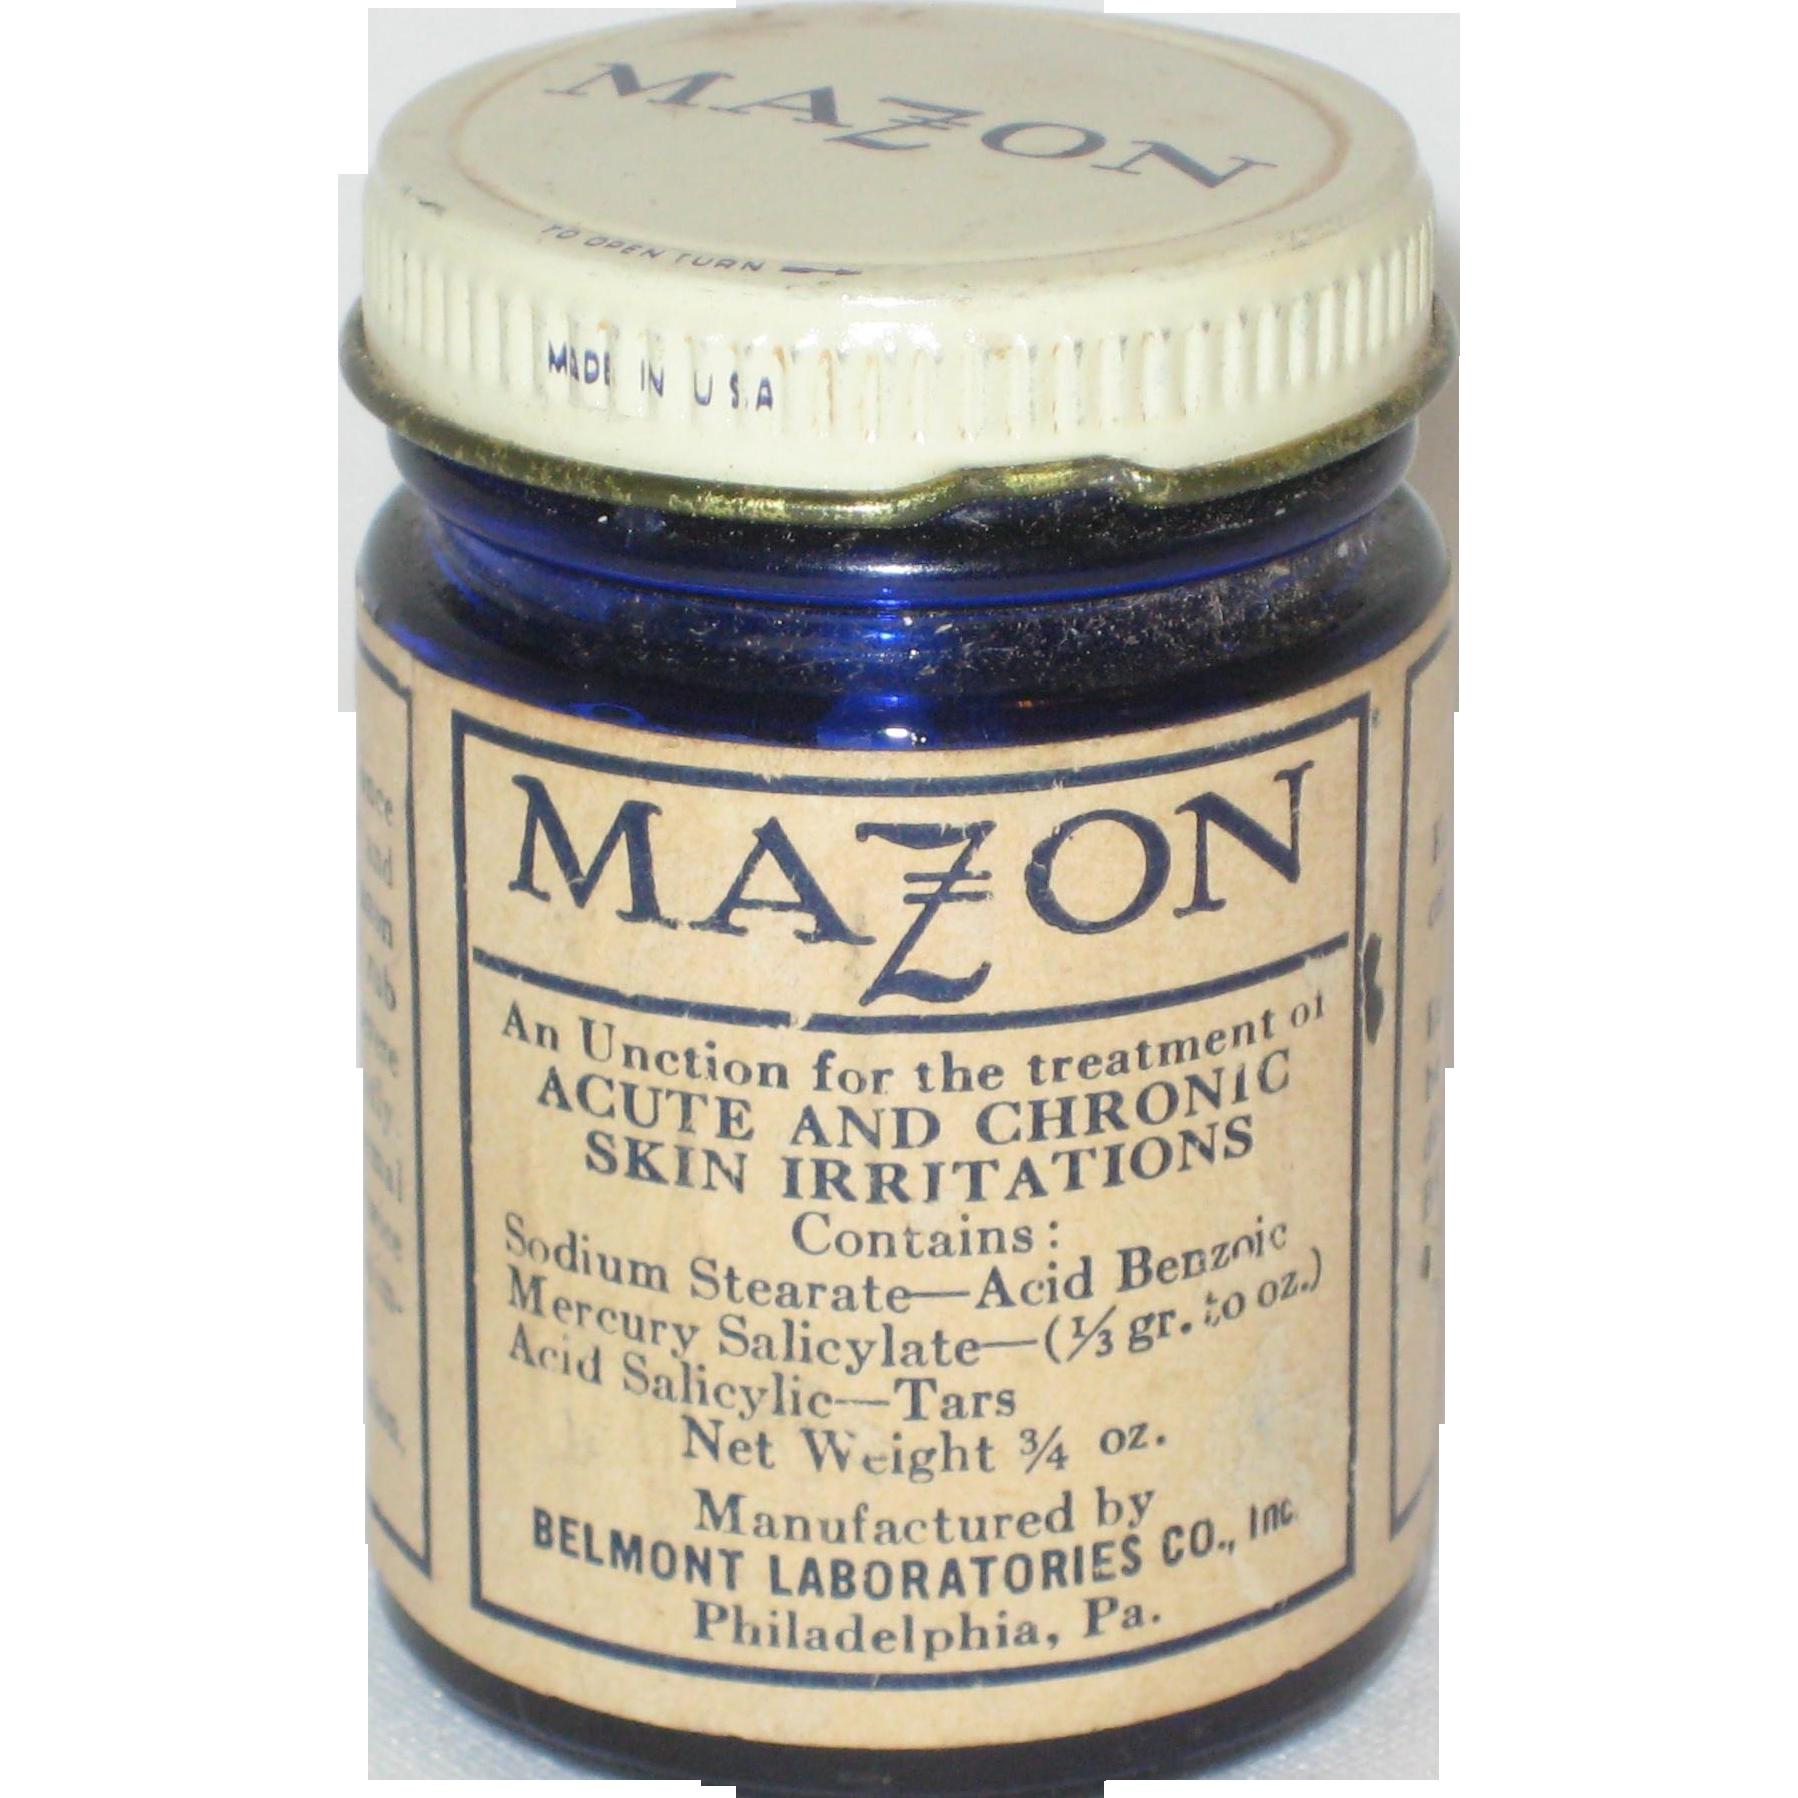 Mazon Cobalt Glass Jar - Medicine Bottle